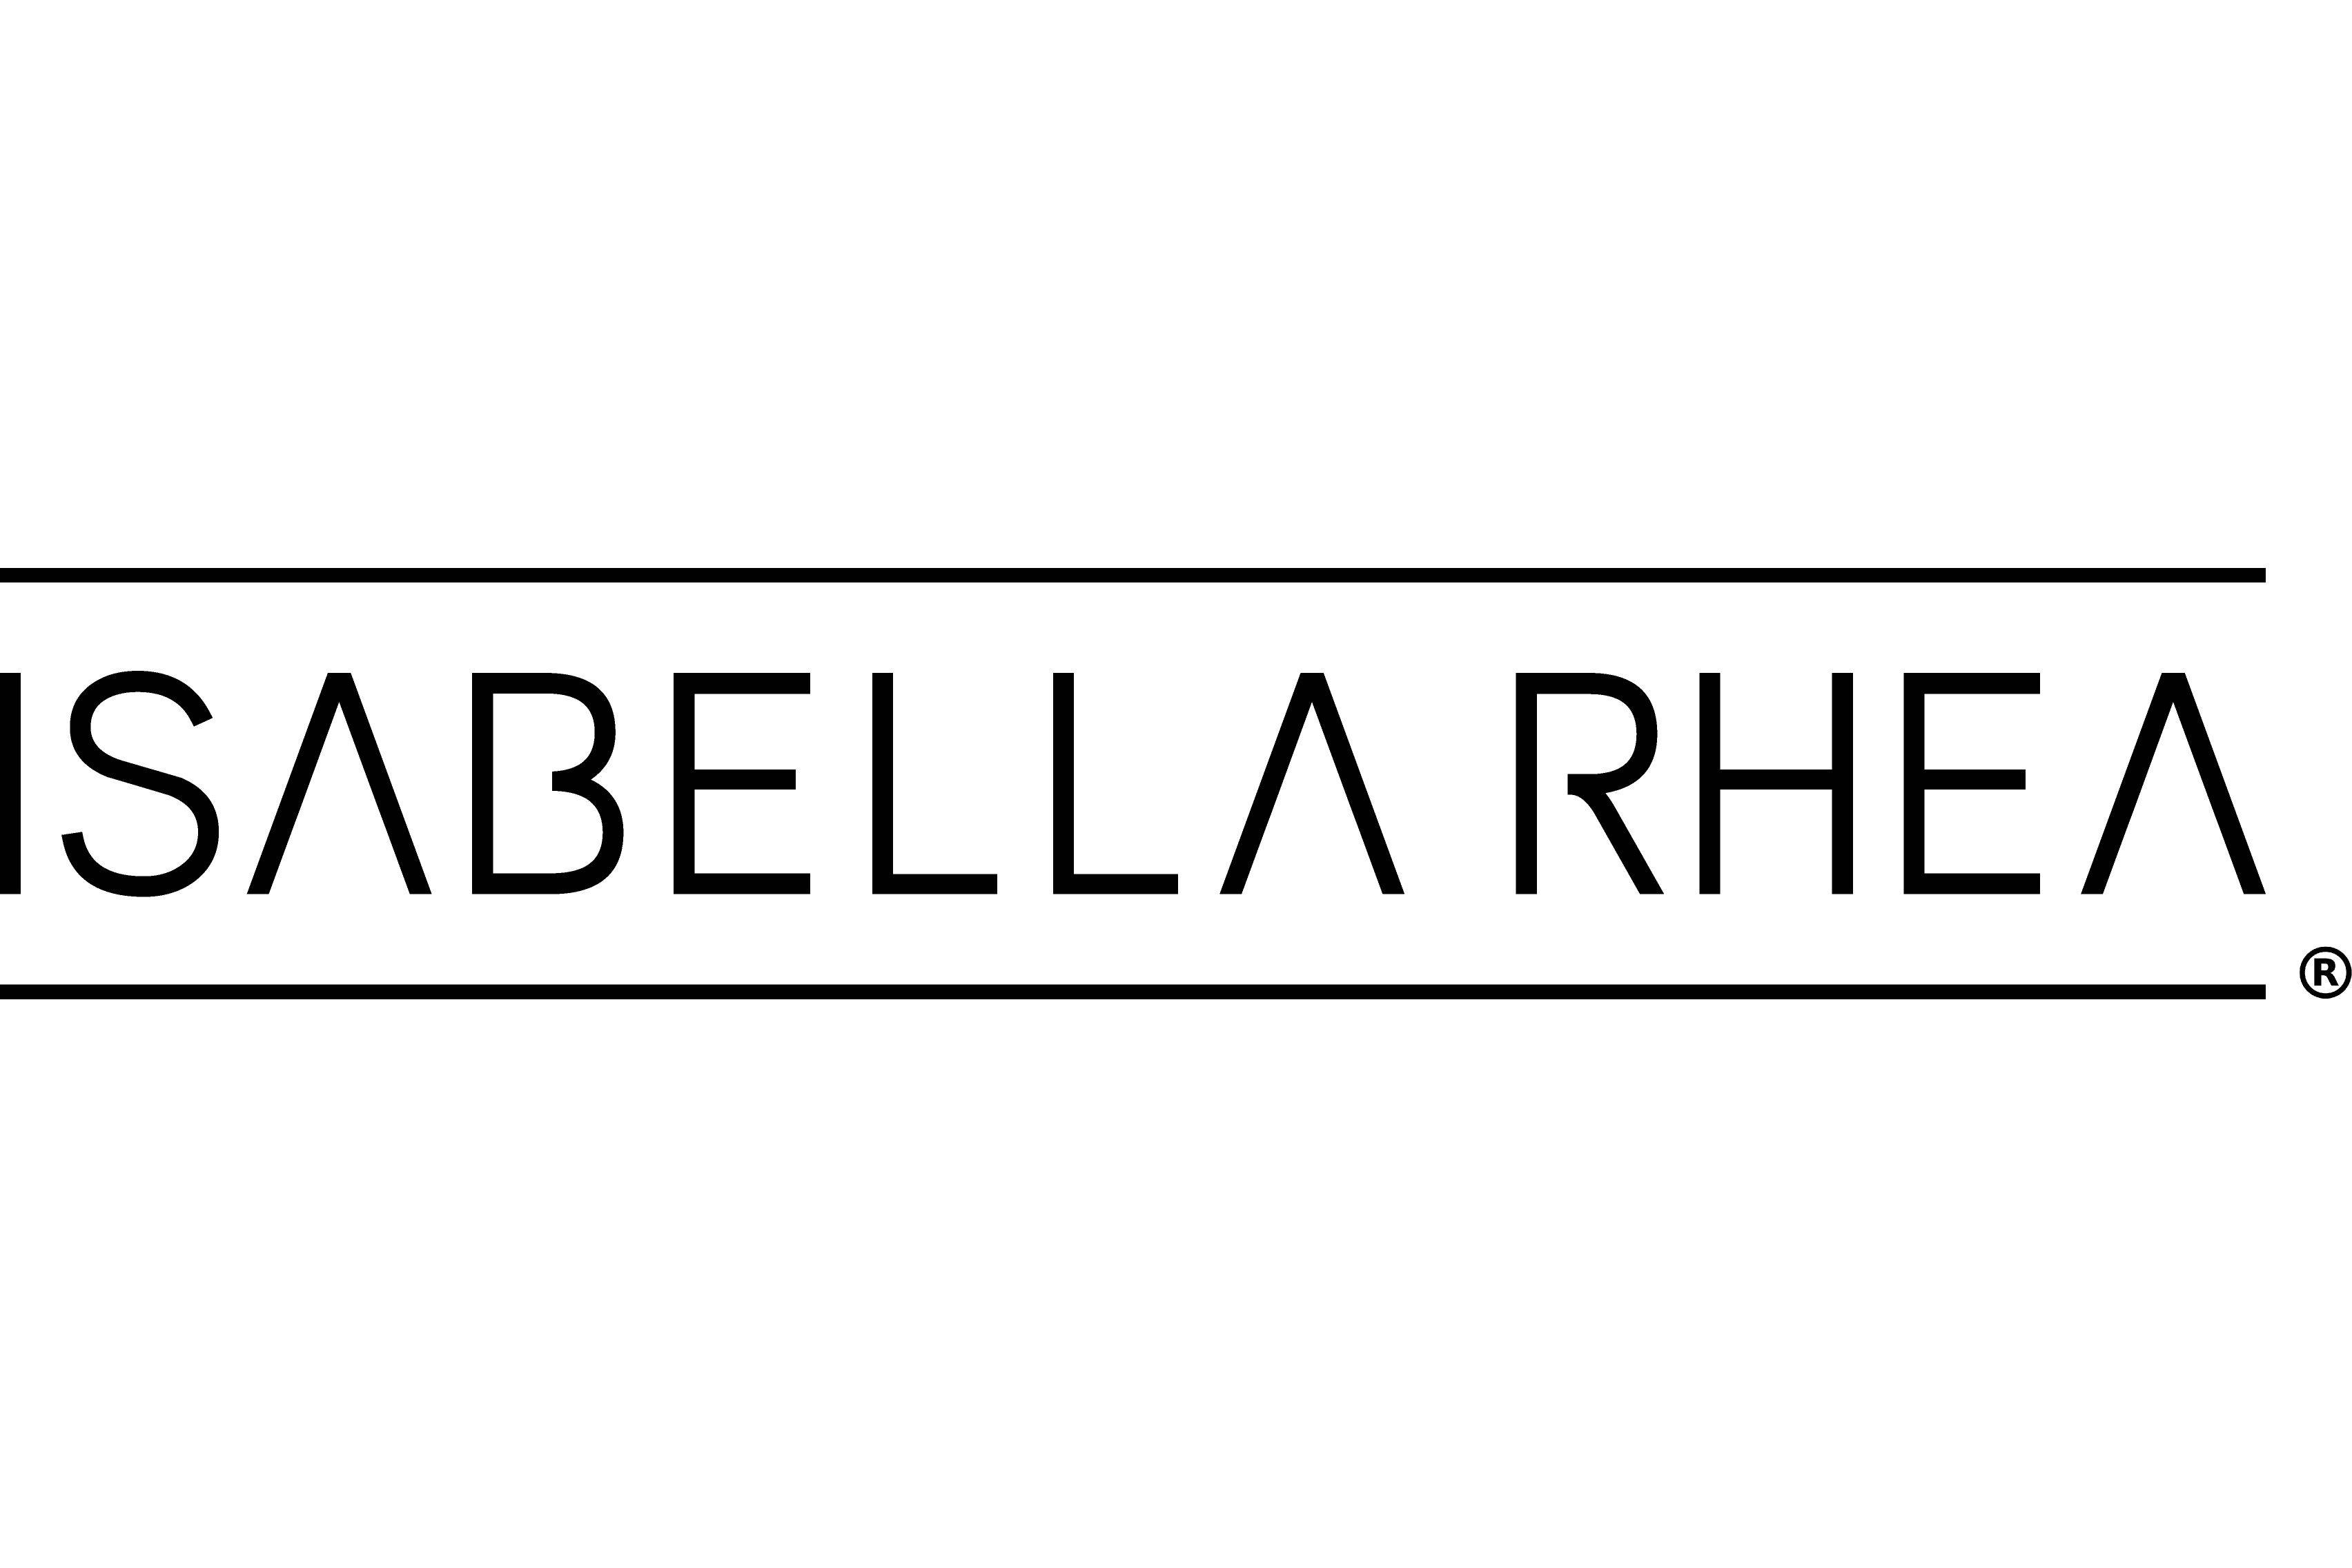 Isabella Rhea